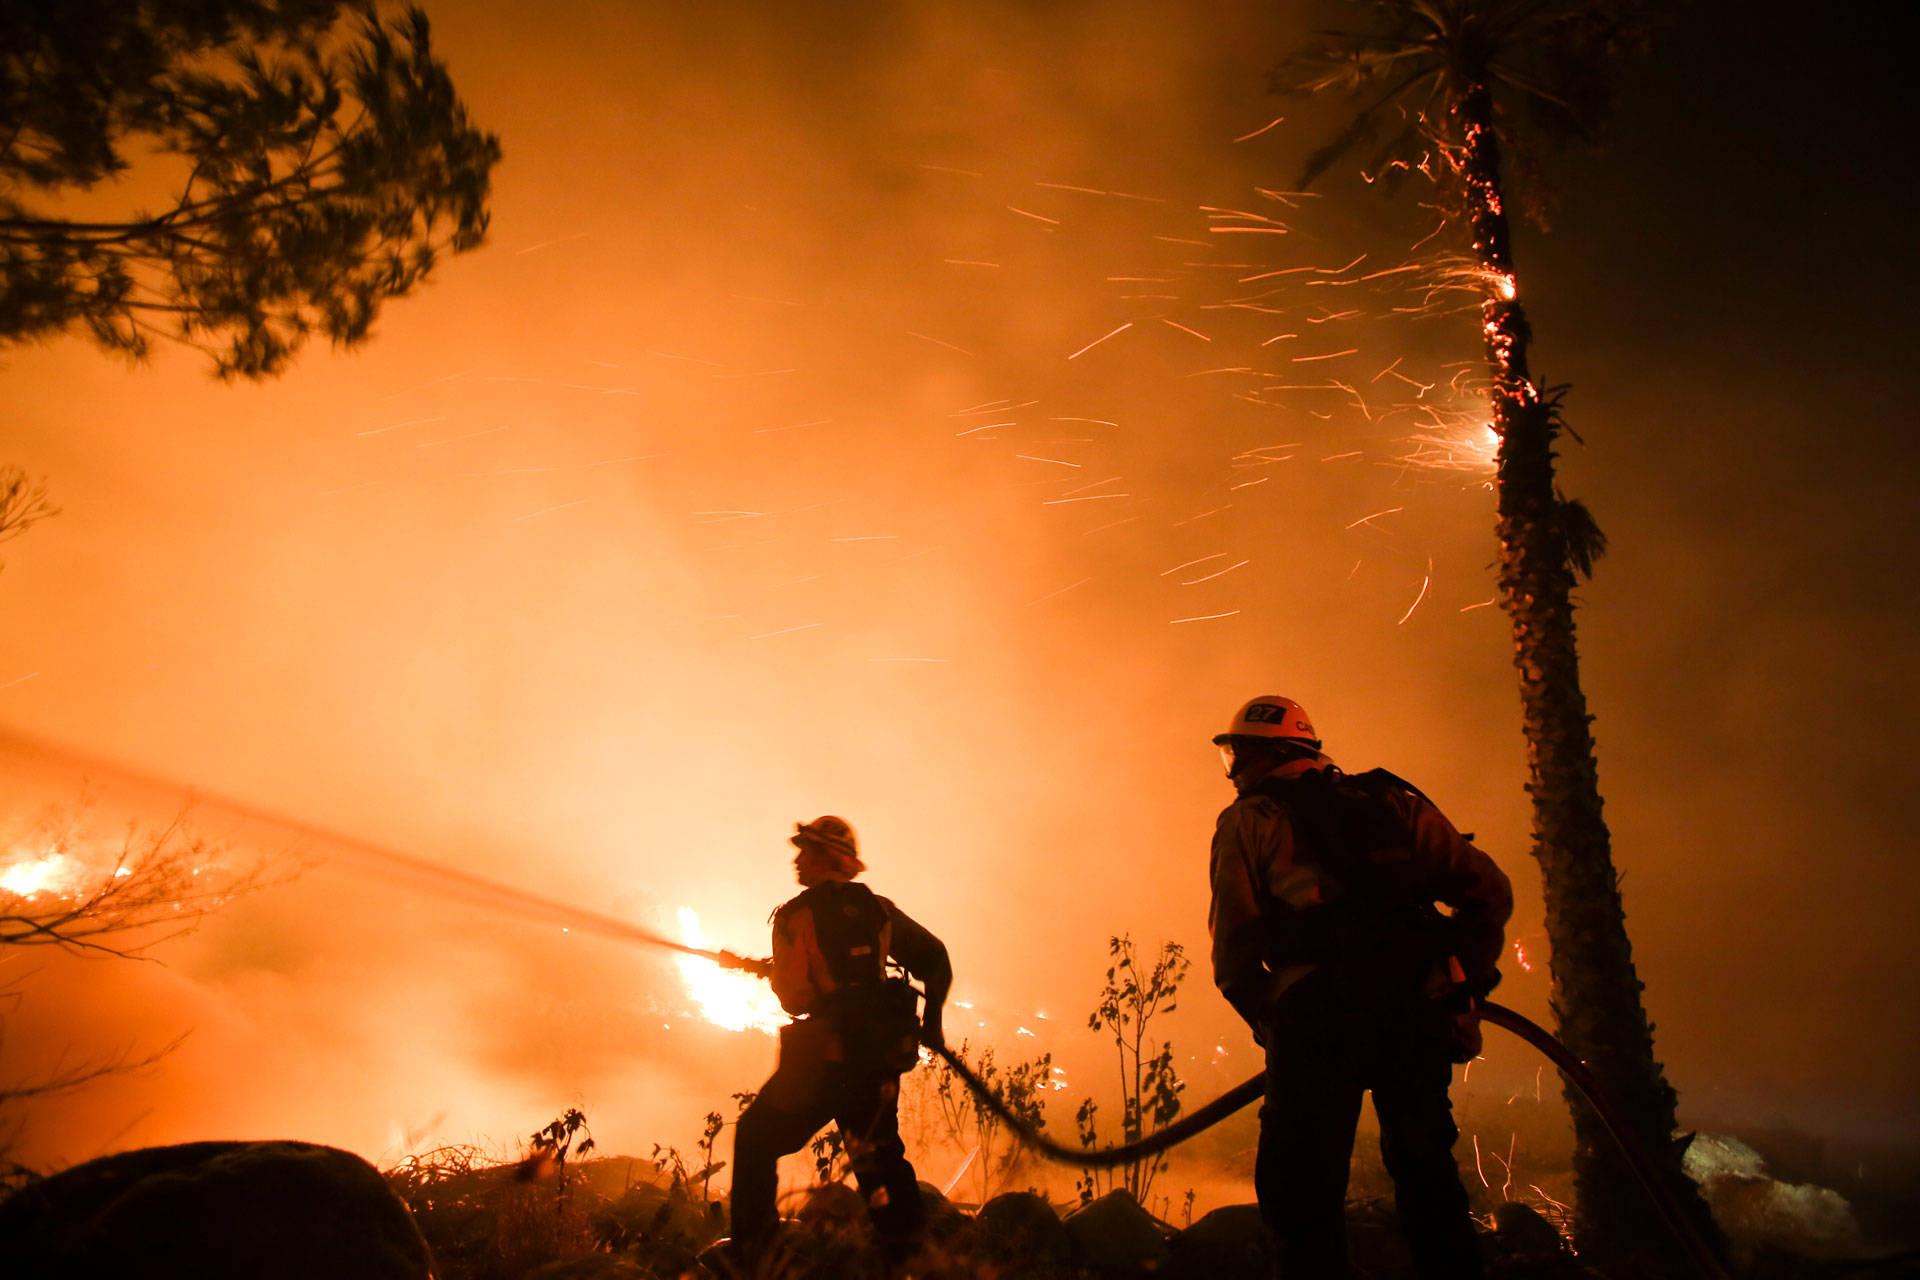 Firefighters battle the Thomas Fire as it burns along a hillside near homes in Santa Paula, northeast of Ventura, on Dec. 5, 2017.